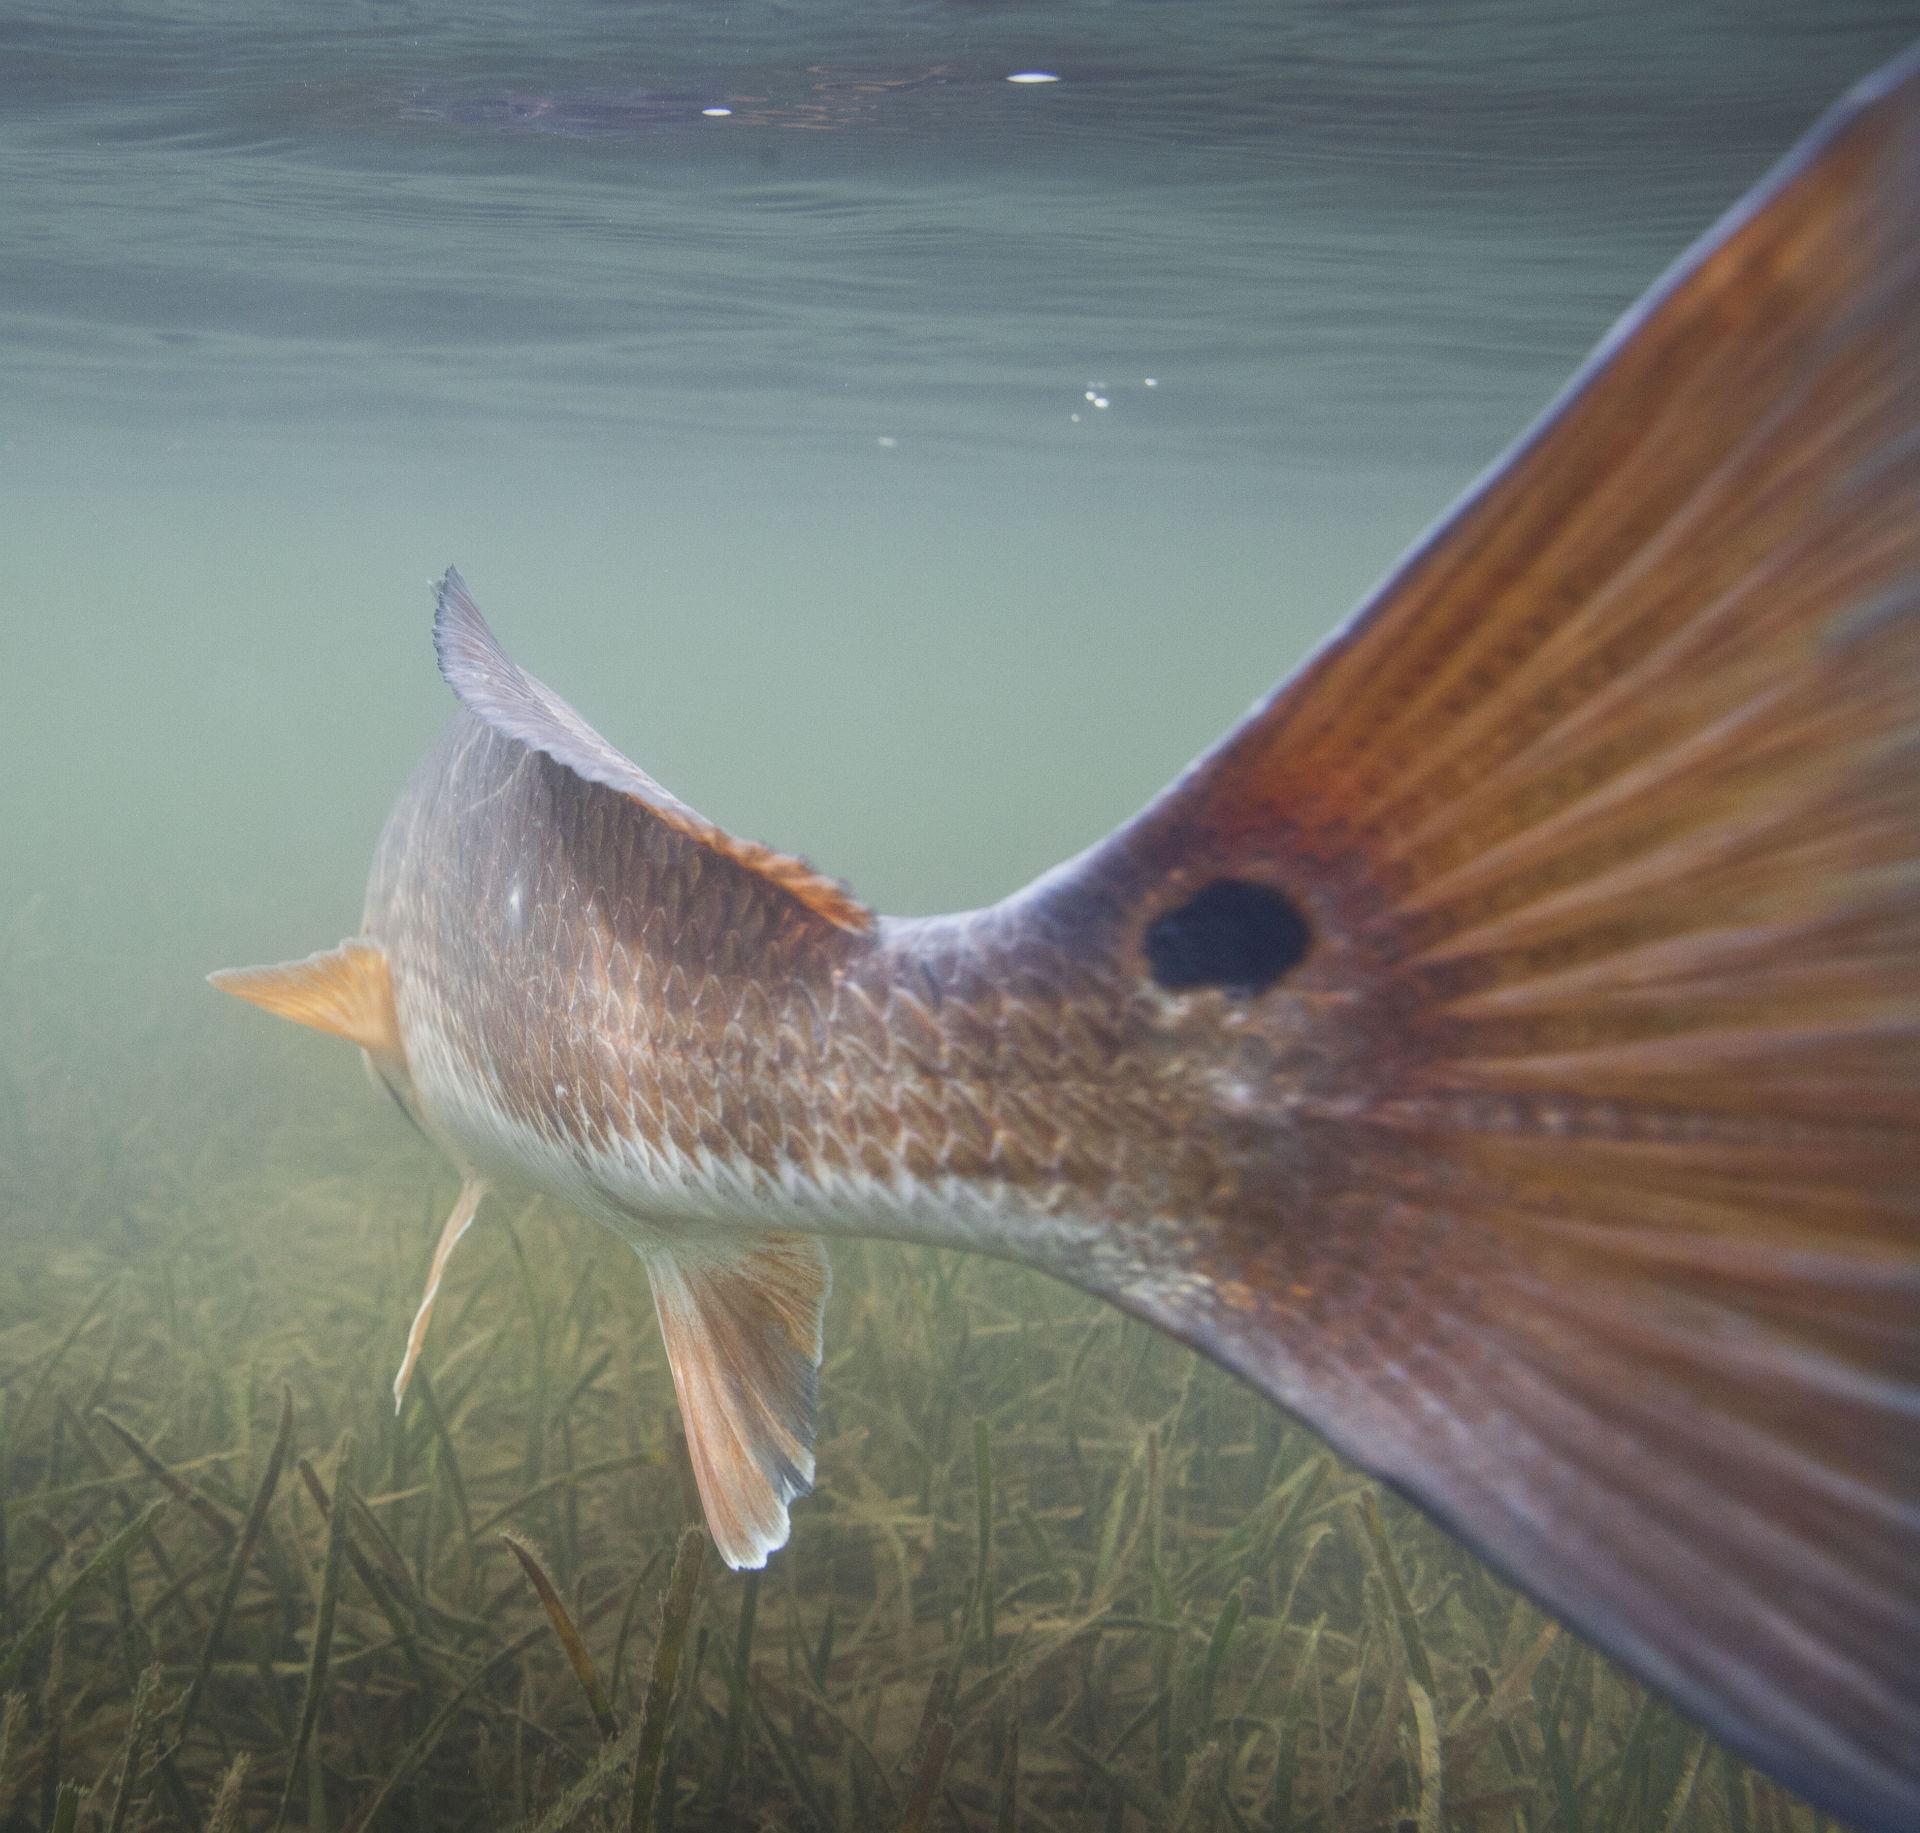 Panama City Beach Fly Fishing Photo Gallery - SWE